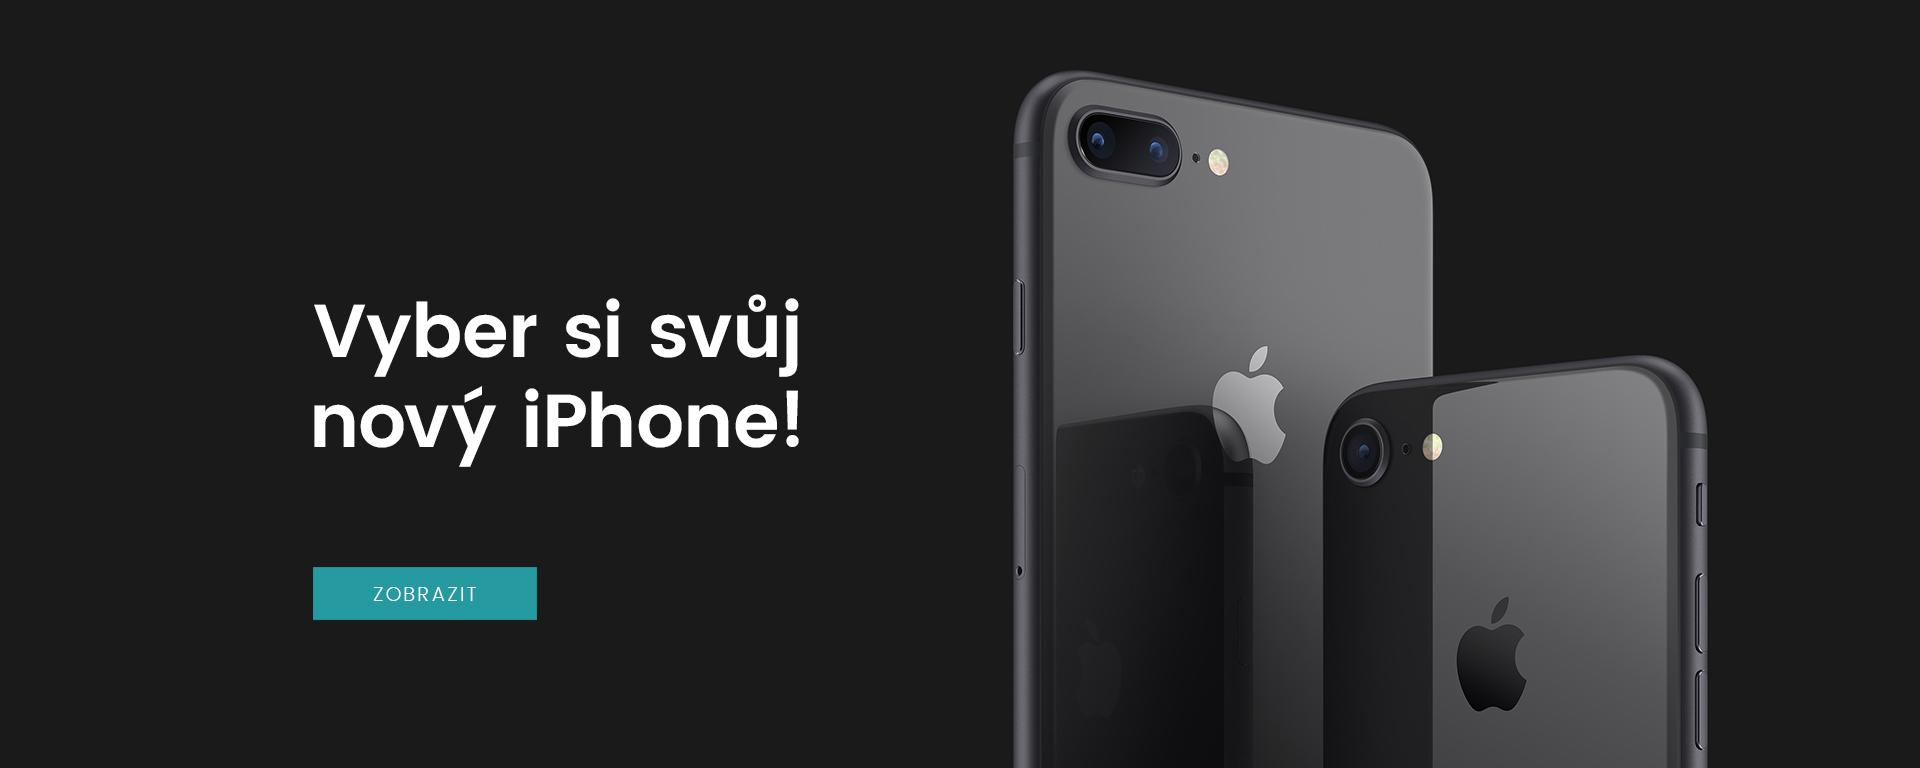 NOVY IPHONE